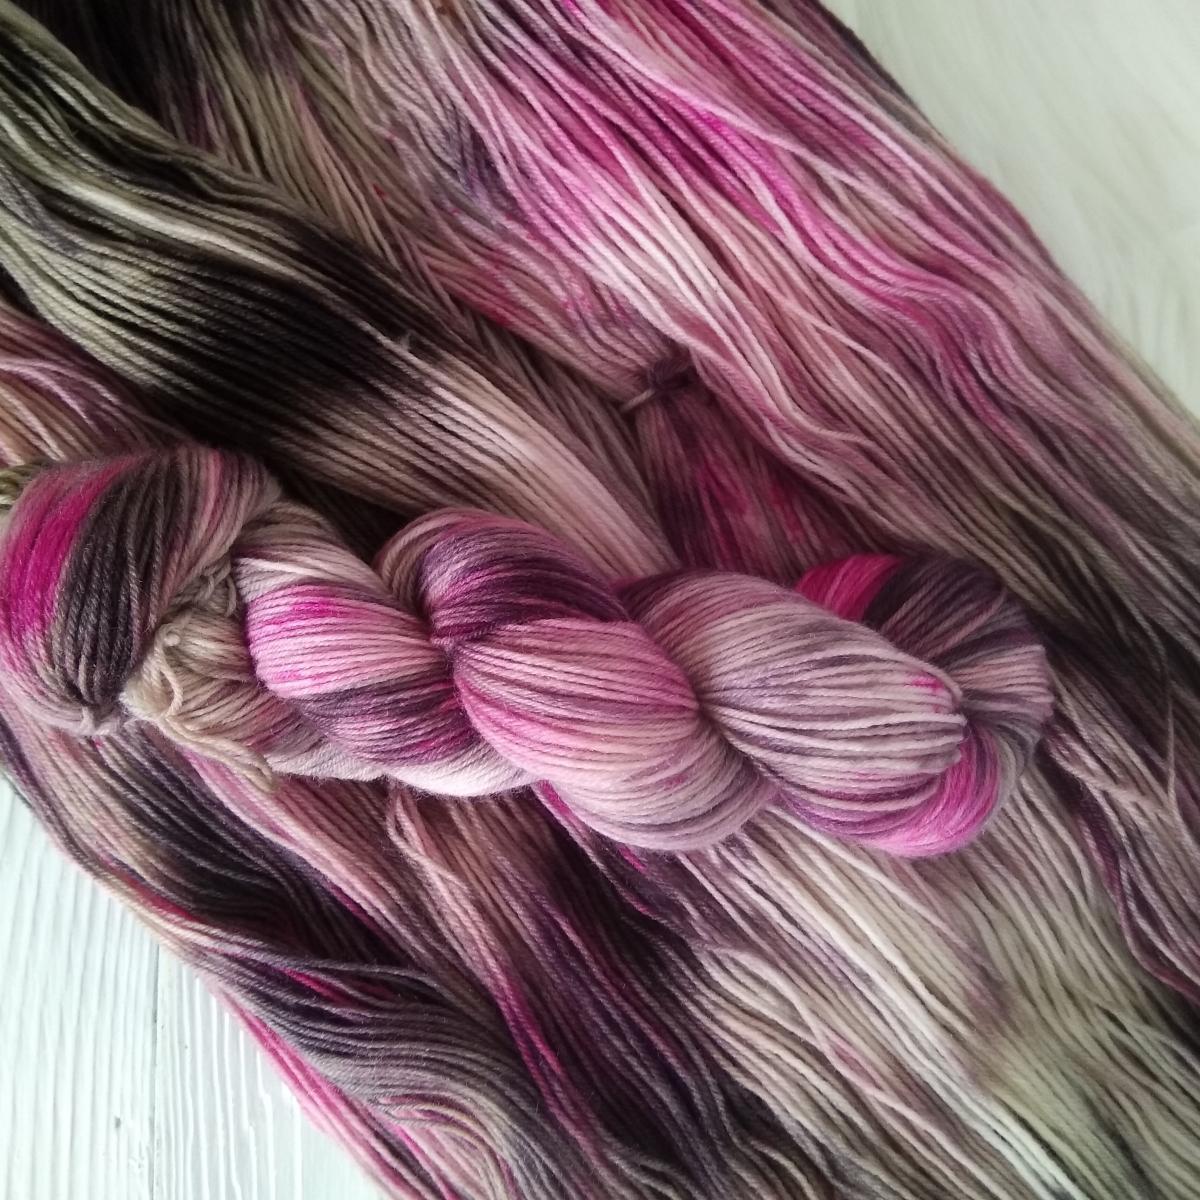 woodico.pro hand dyed yarn 037 2 1200x1200 - Hand dyed yarn / 037